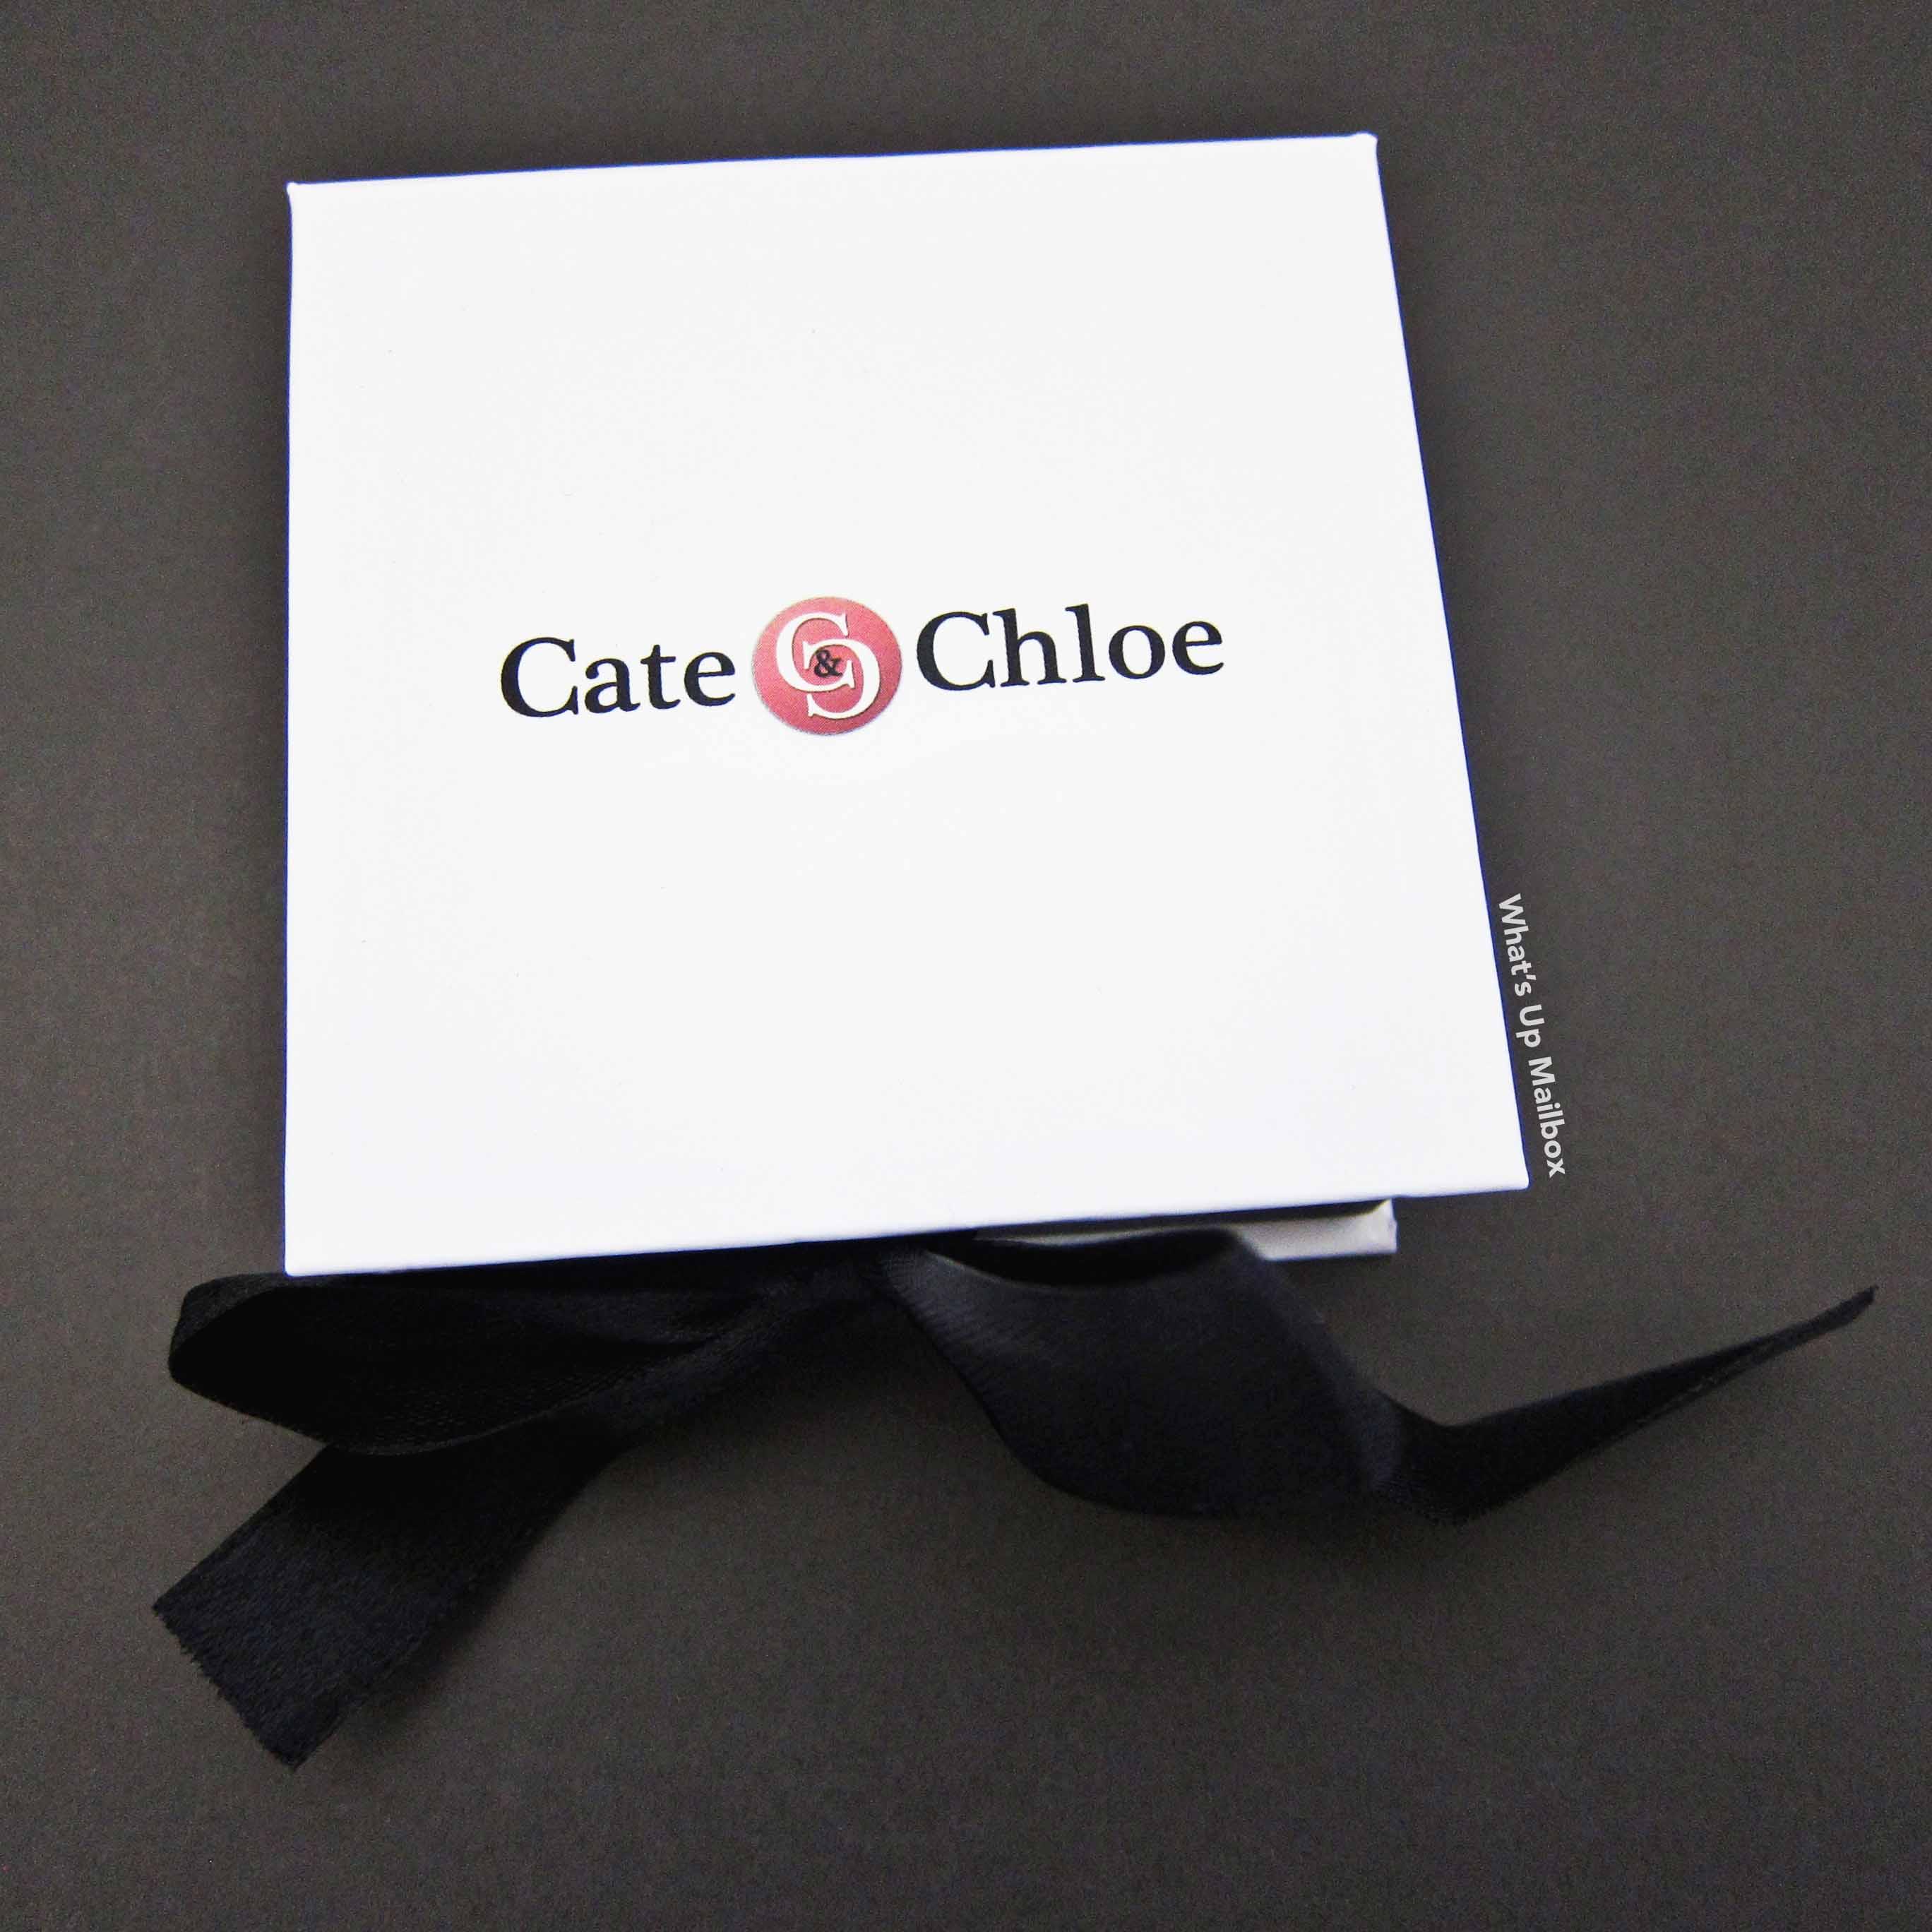 Cate & Chloe VIP August 2016 Jewelry Box